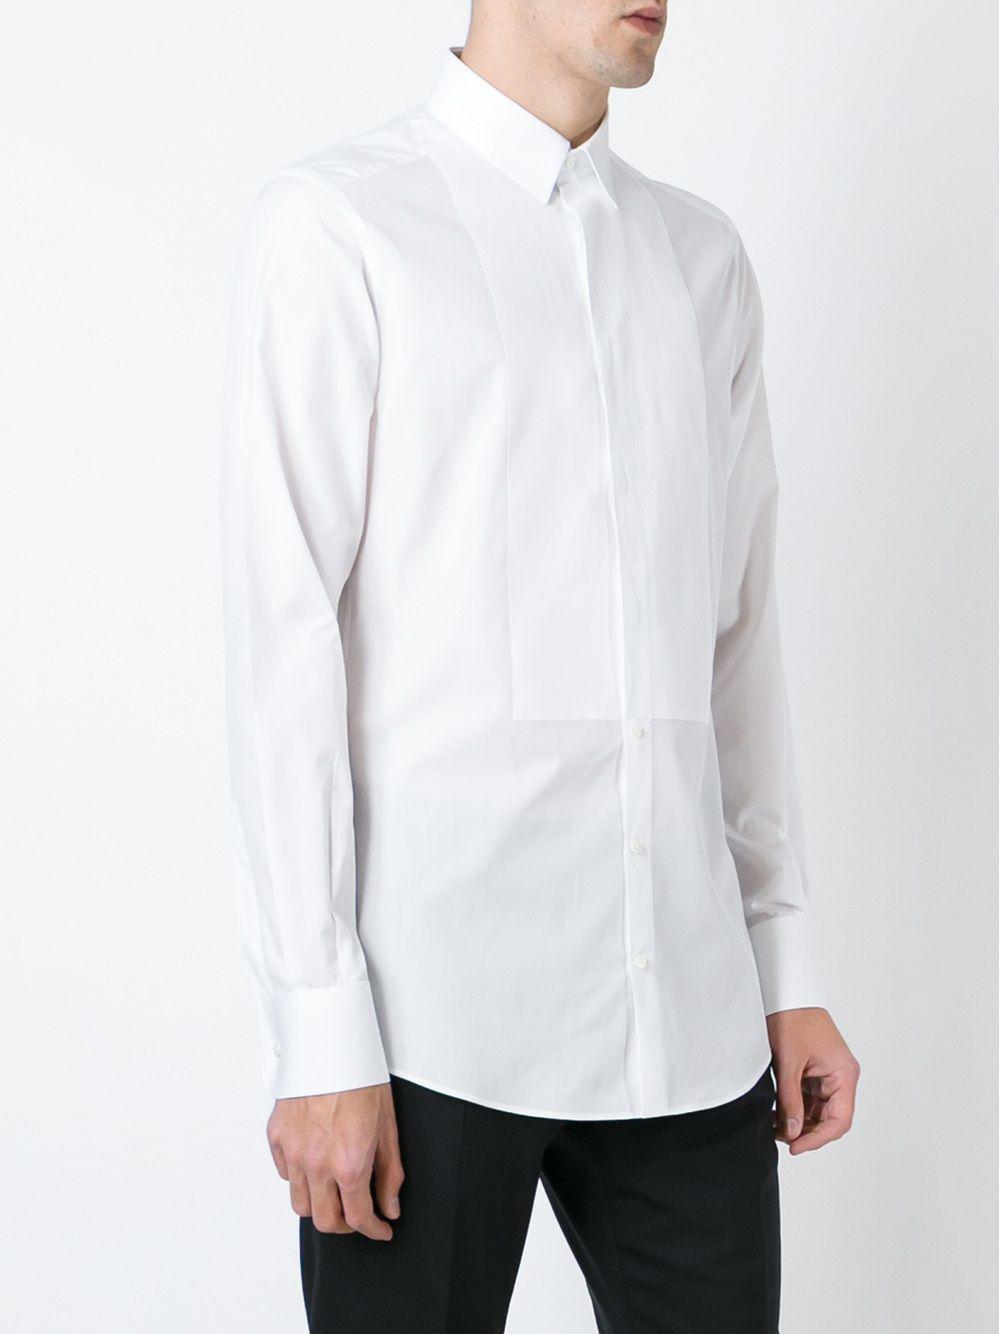 Dolce & Gabbana Cotton Bib Shirt in White for Men